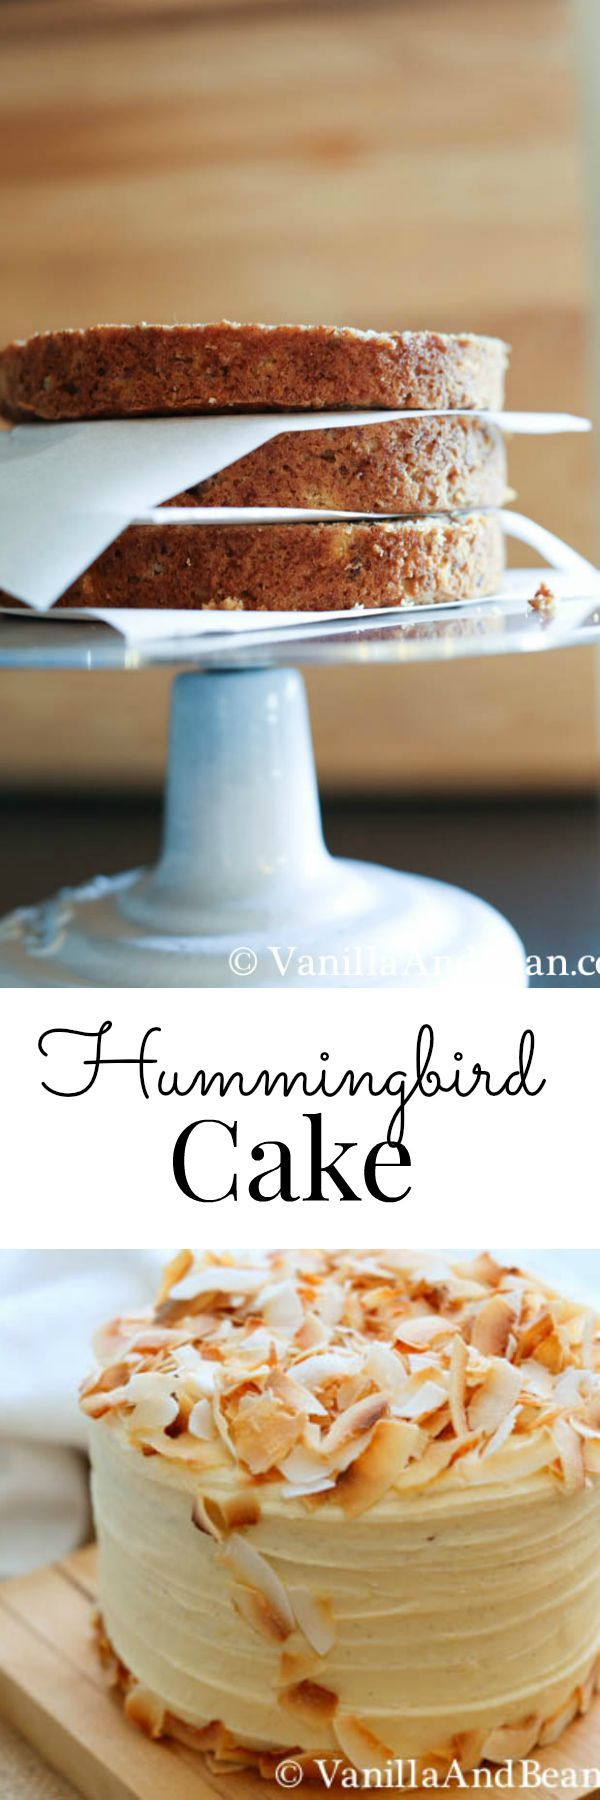 Hummingbird Cake with Lemon Cream Cheese Icing; a classic | Vanilla And Bean